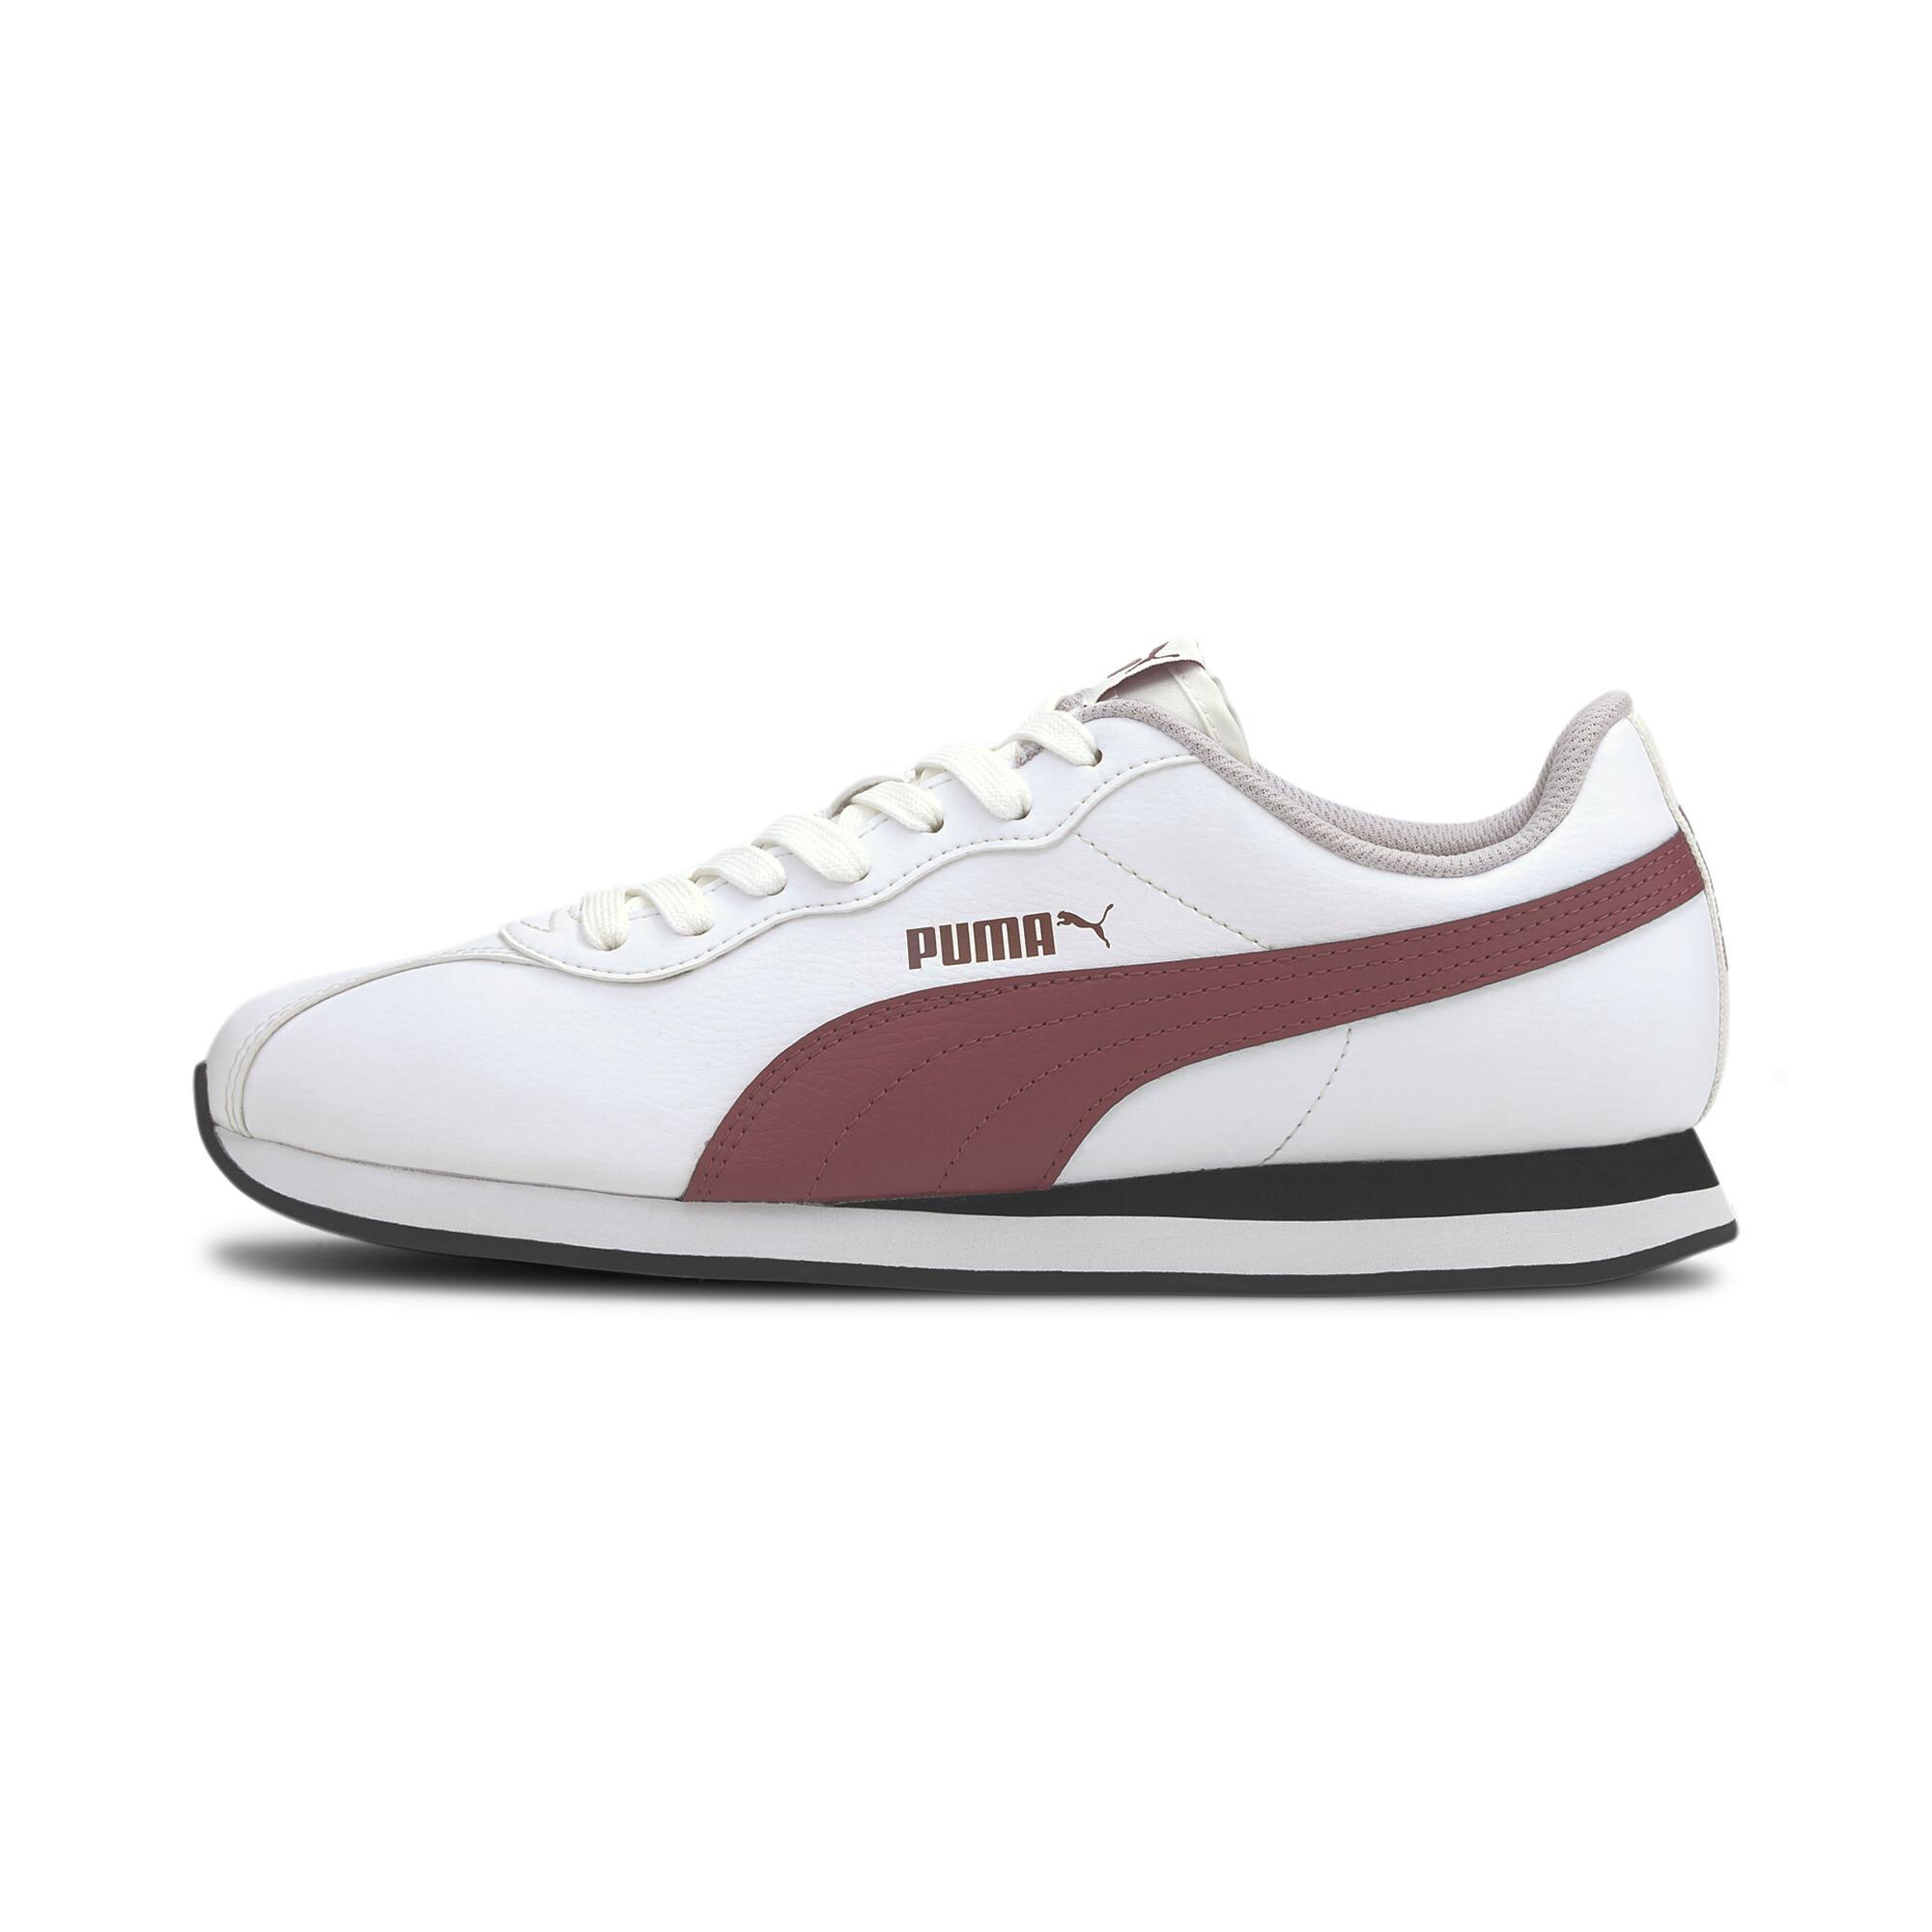 PUMA-Men-039-s-Turin-II-Sneakers thumbnail 27